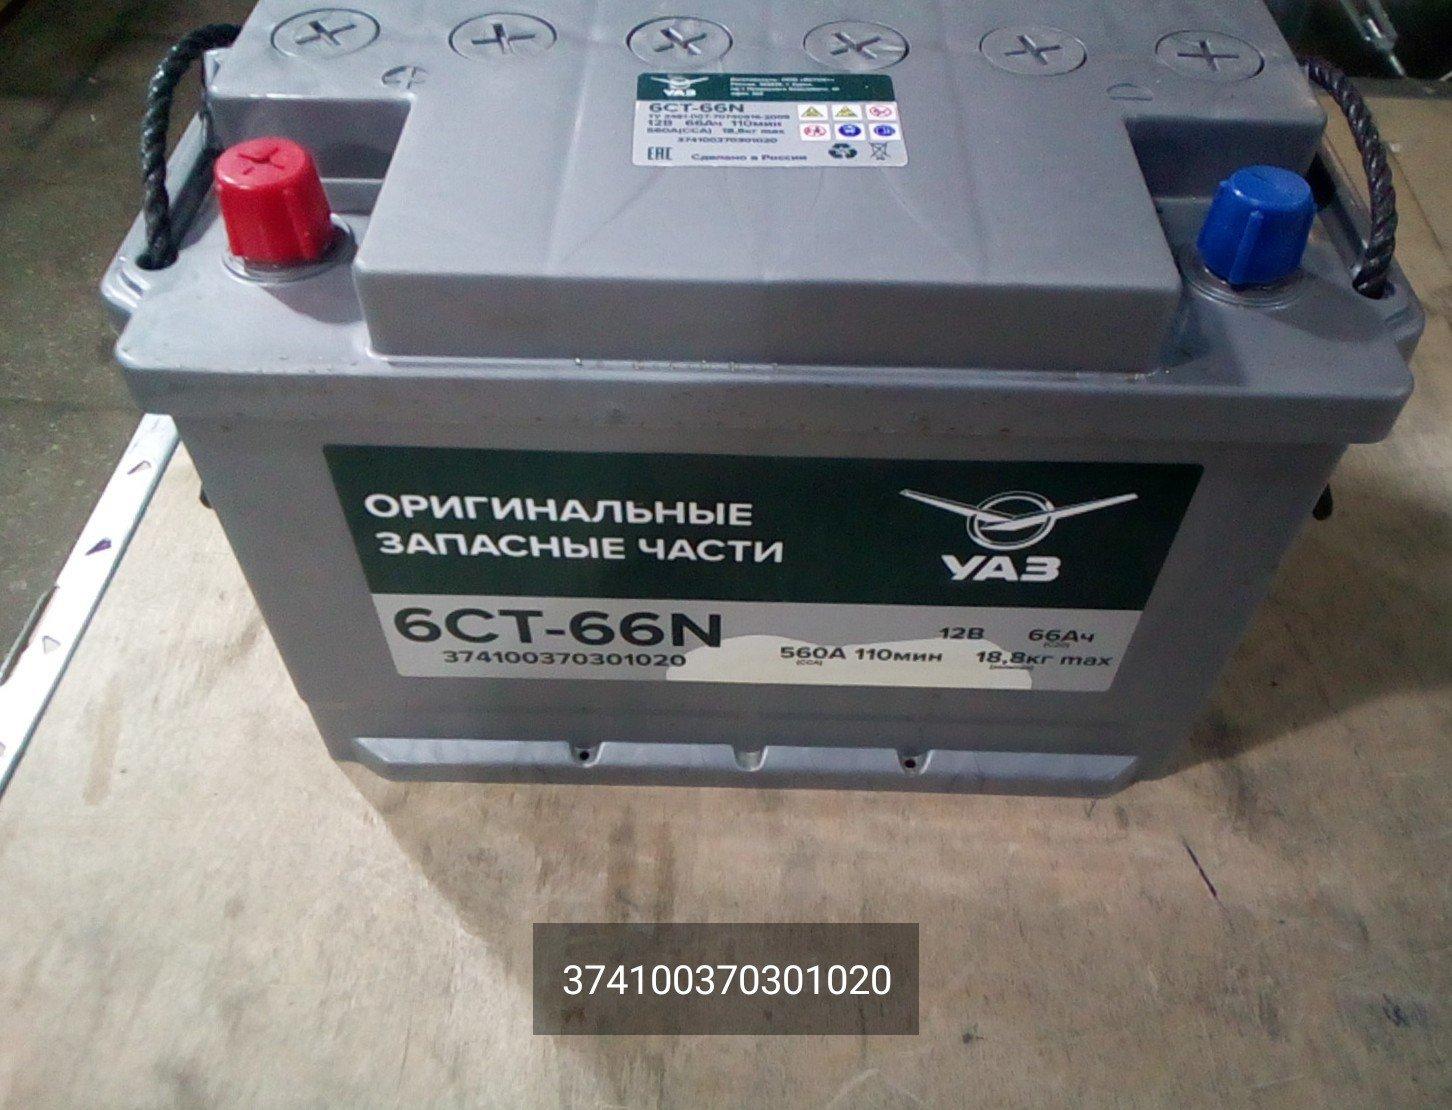 Battery Rechargeable 6st-66az 12v 66ah 525A Russian (293*175*190) UAZ for UAZ Patriot, I, 3163 2.7 Mt (128) 4WD (2005 - 2